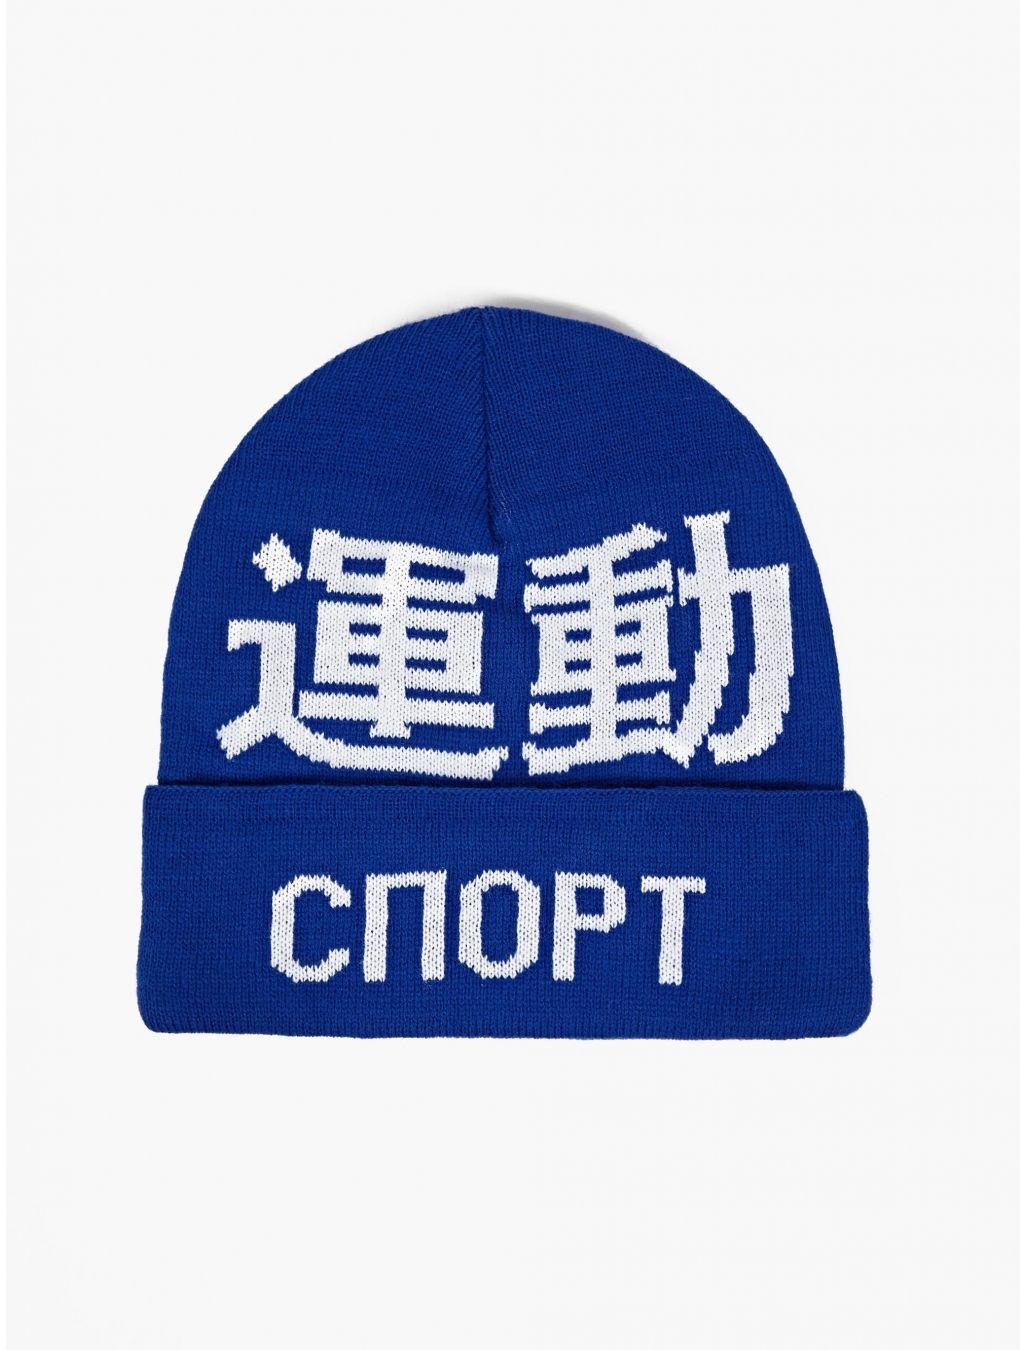 Gosha Rubchinskiy Blue Graphic Beanie Hat  3476595ca4a0